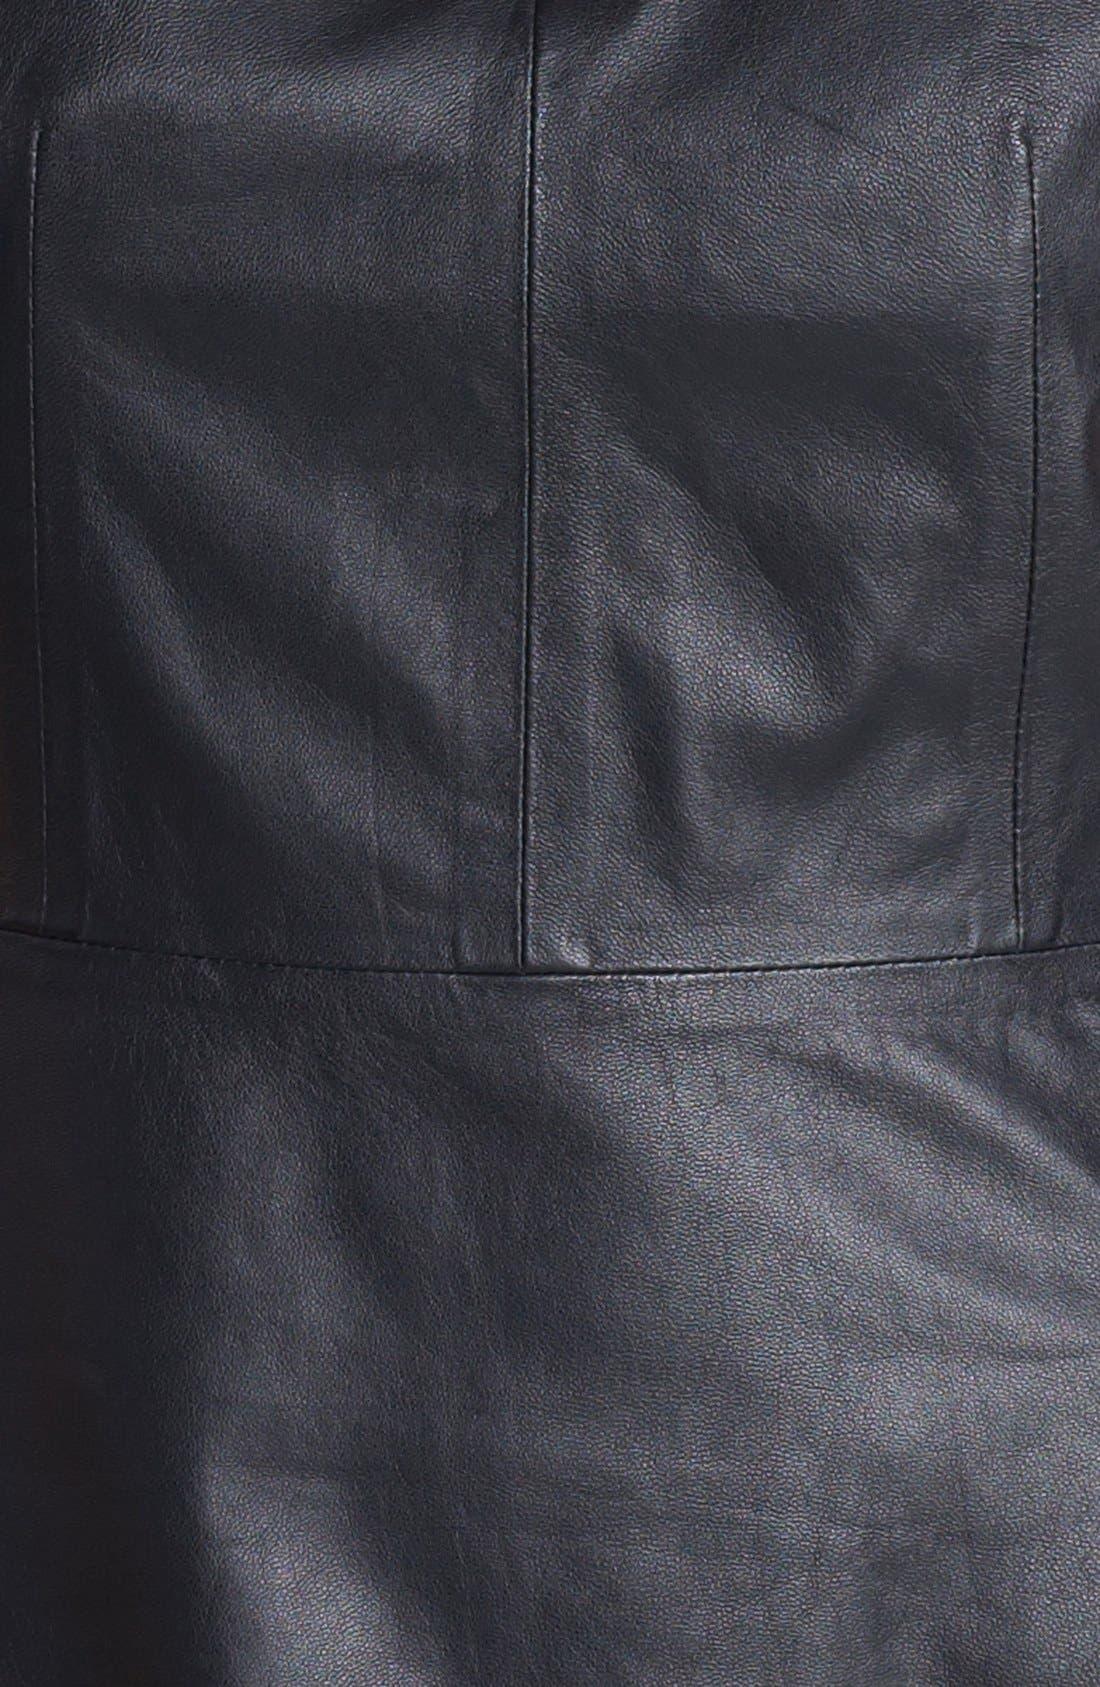 'Etia L.' Leather Top,                             Alternate thumbnail 2, color,                             001